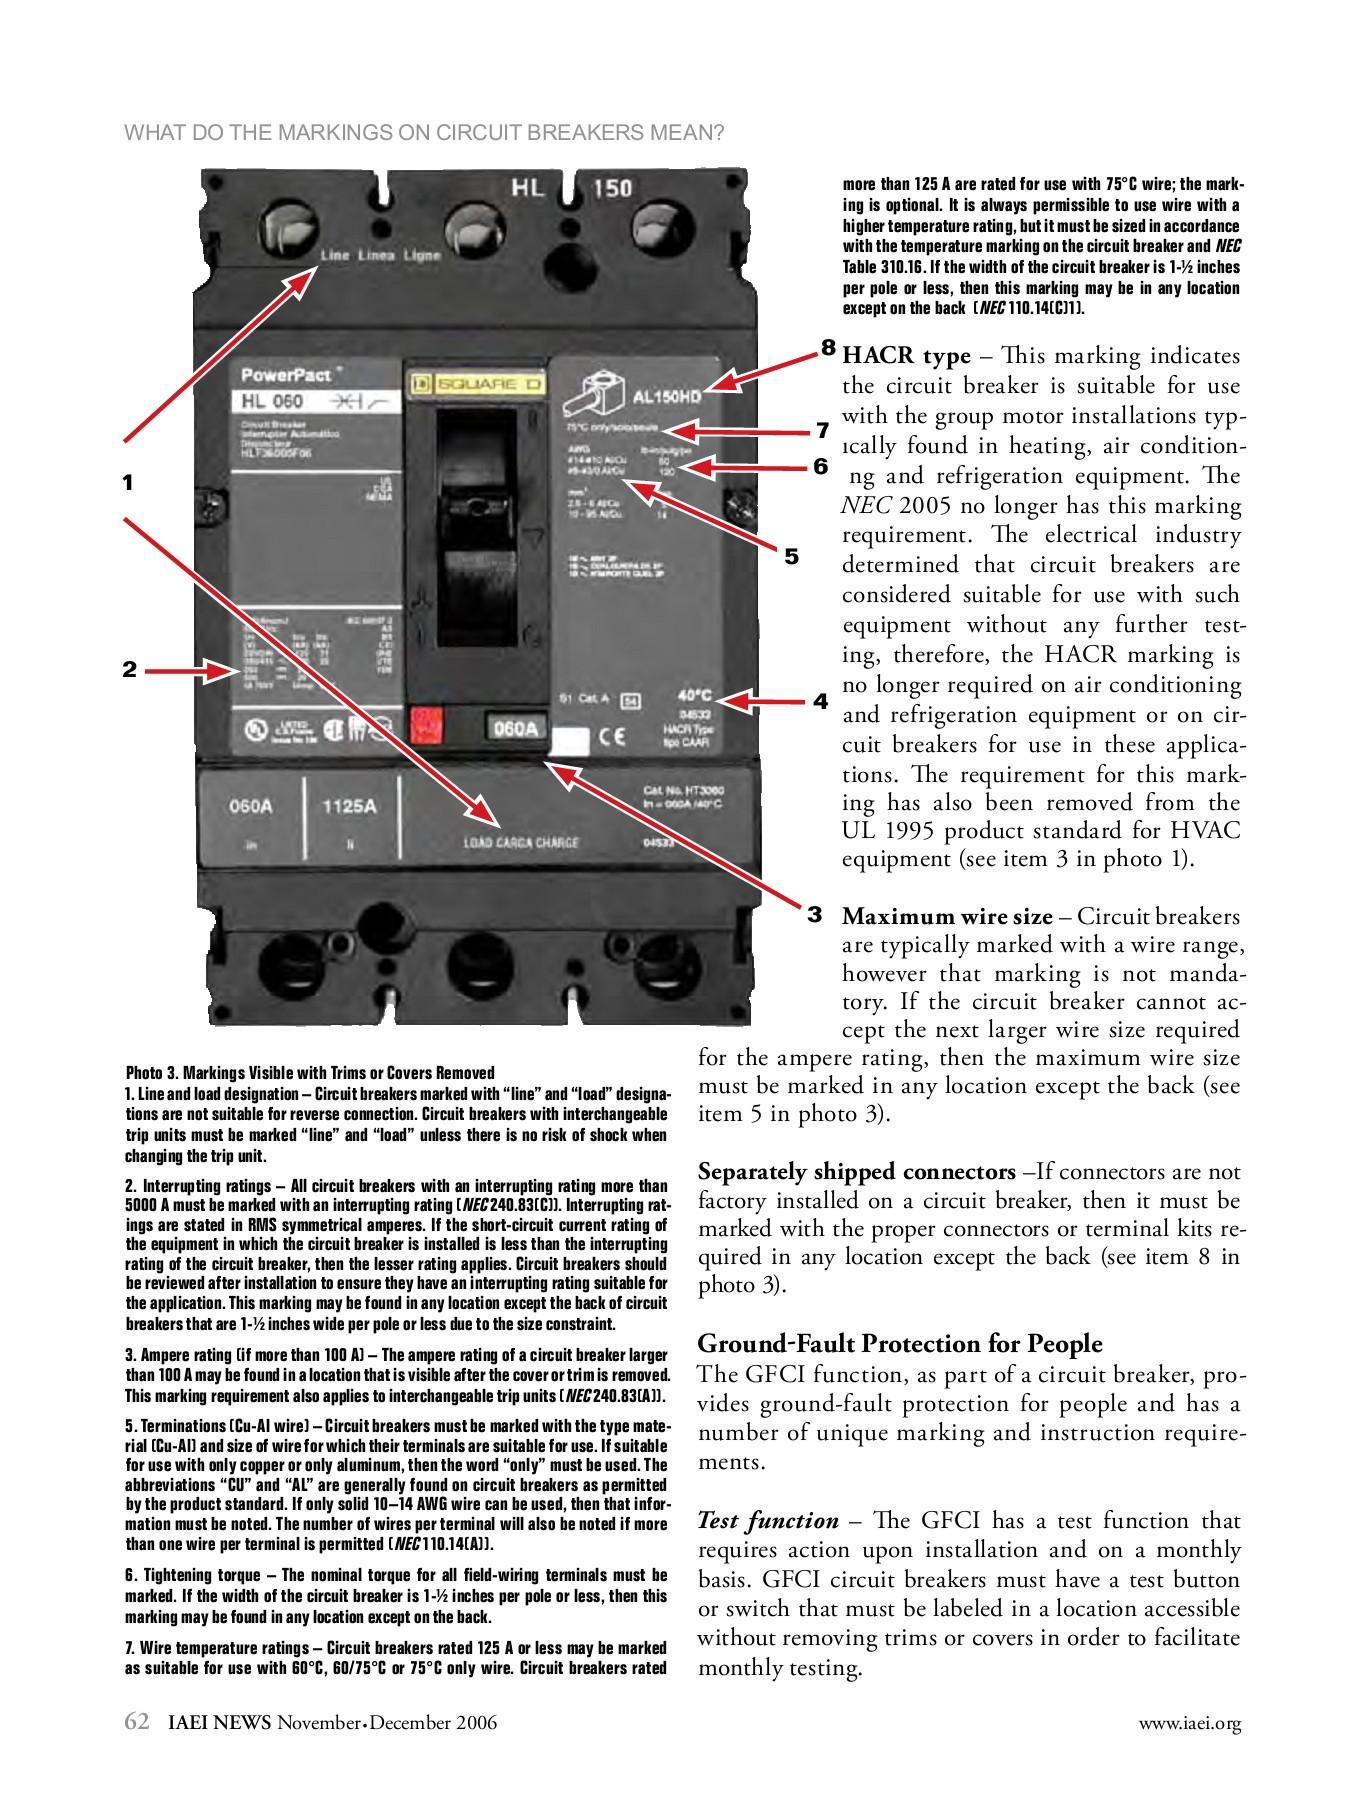 Circuit Breaker Abbreviations : circuit, breaker, abbreviations, Markings, Circuit, Breakers, Mean?, Schneider, Electric-Flip, EBook, Pages, AnyFlip